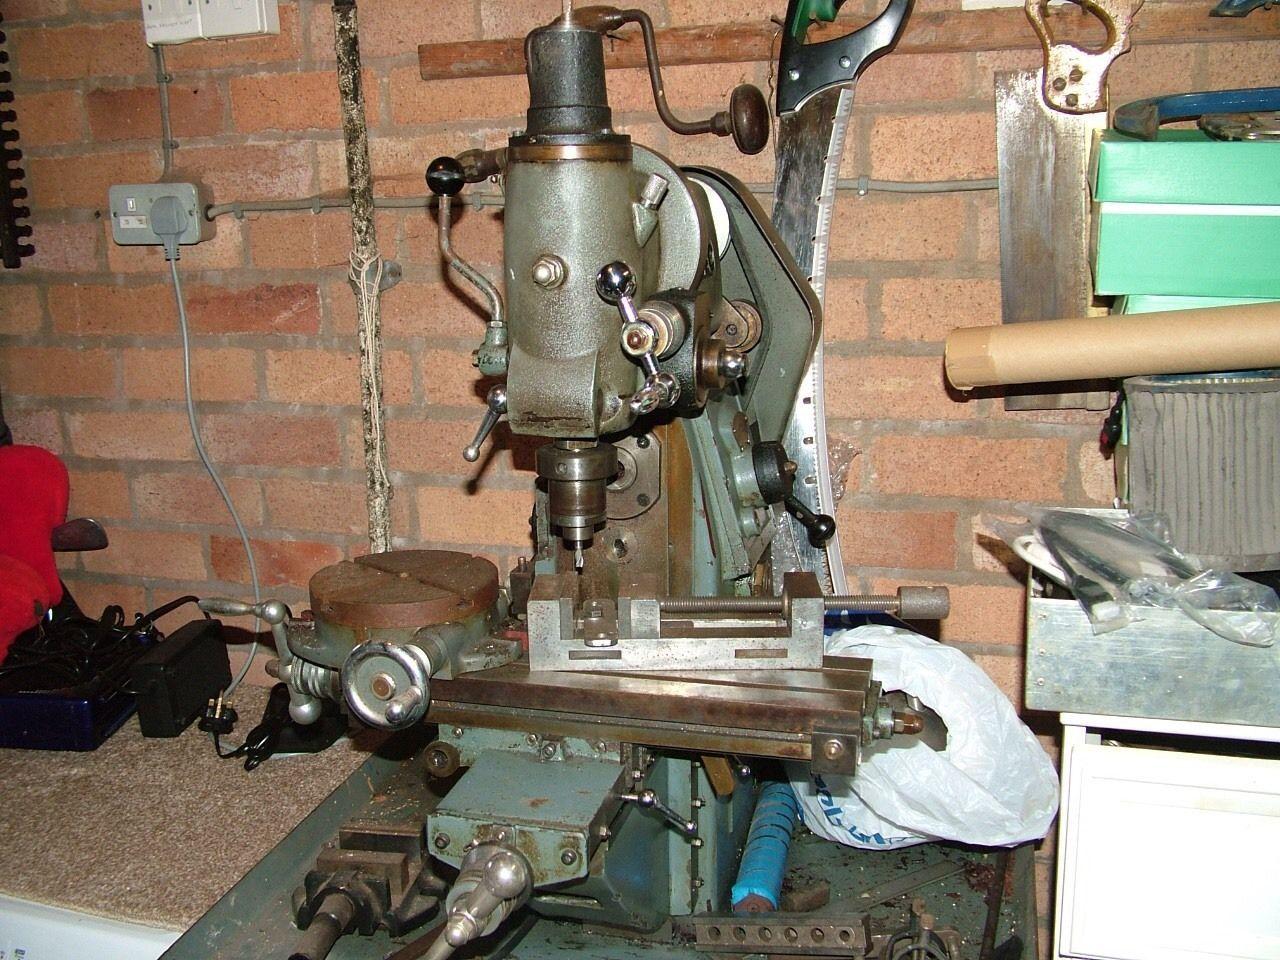 centec milling machine Milling machine, Machine, Milling